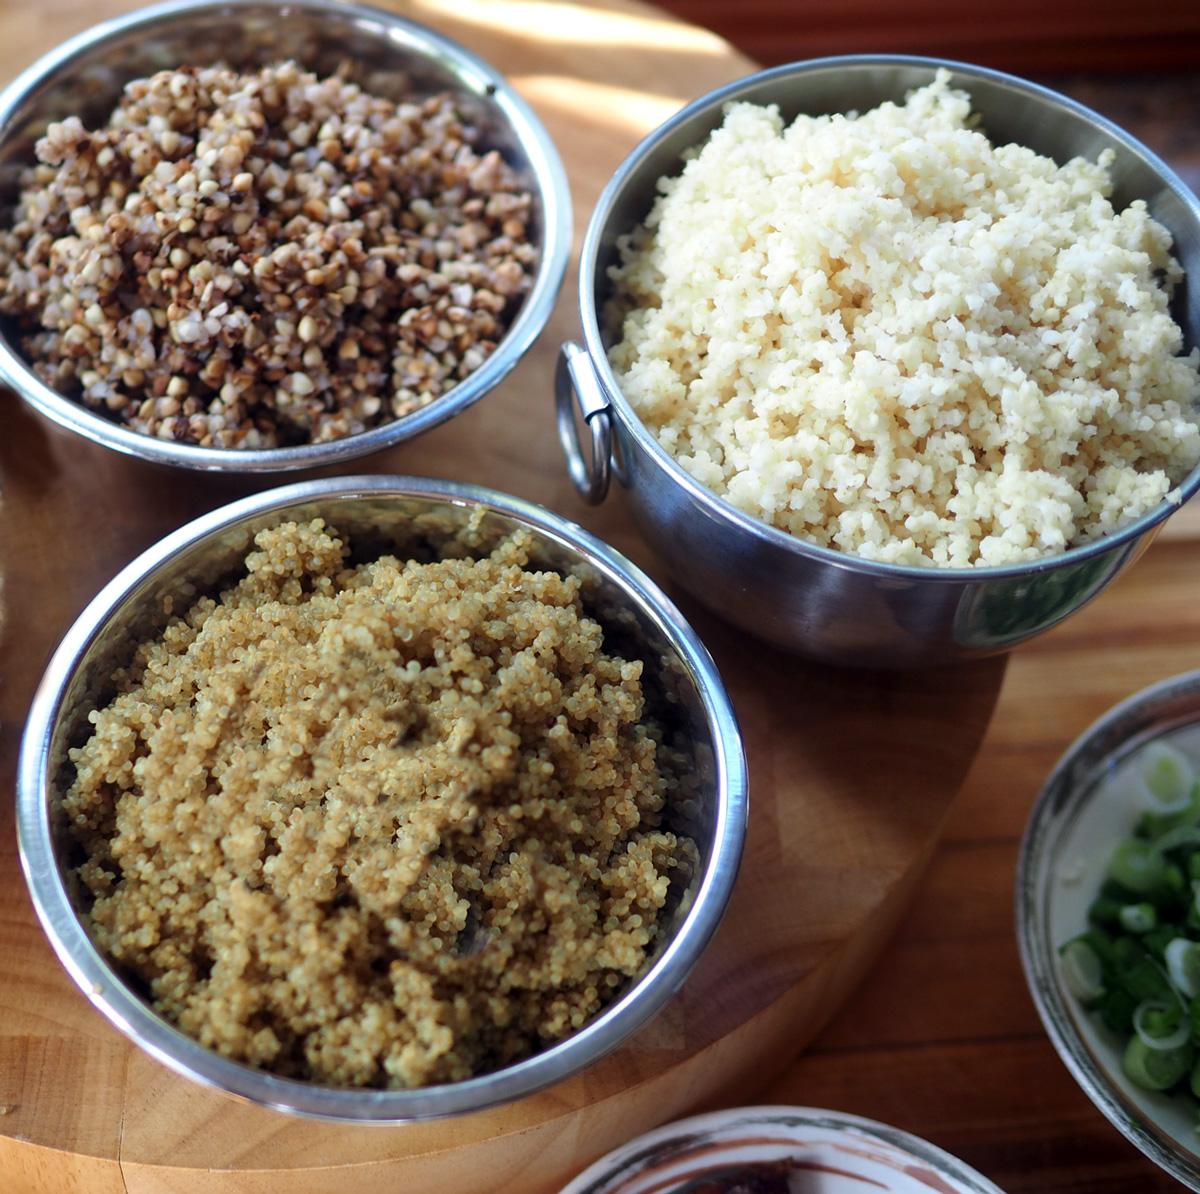 Cooked kasha, milliet, quinoa.